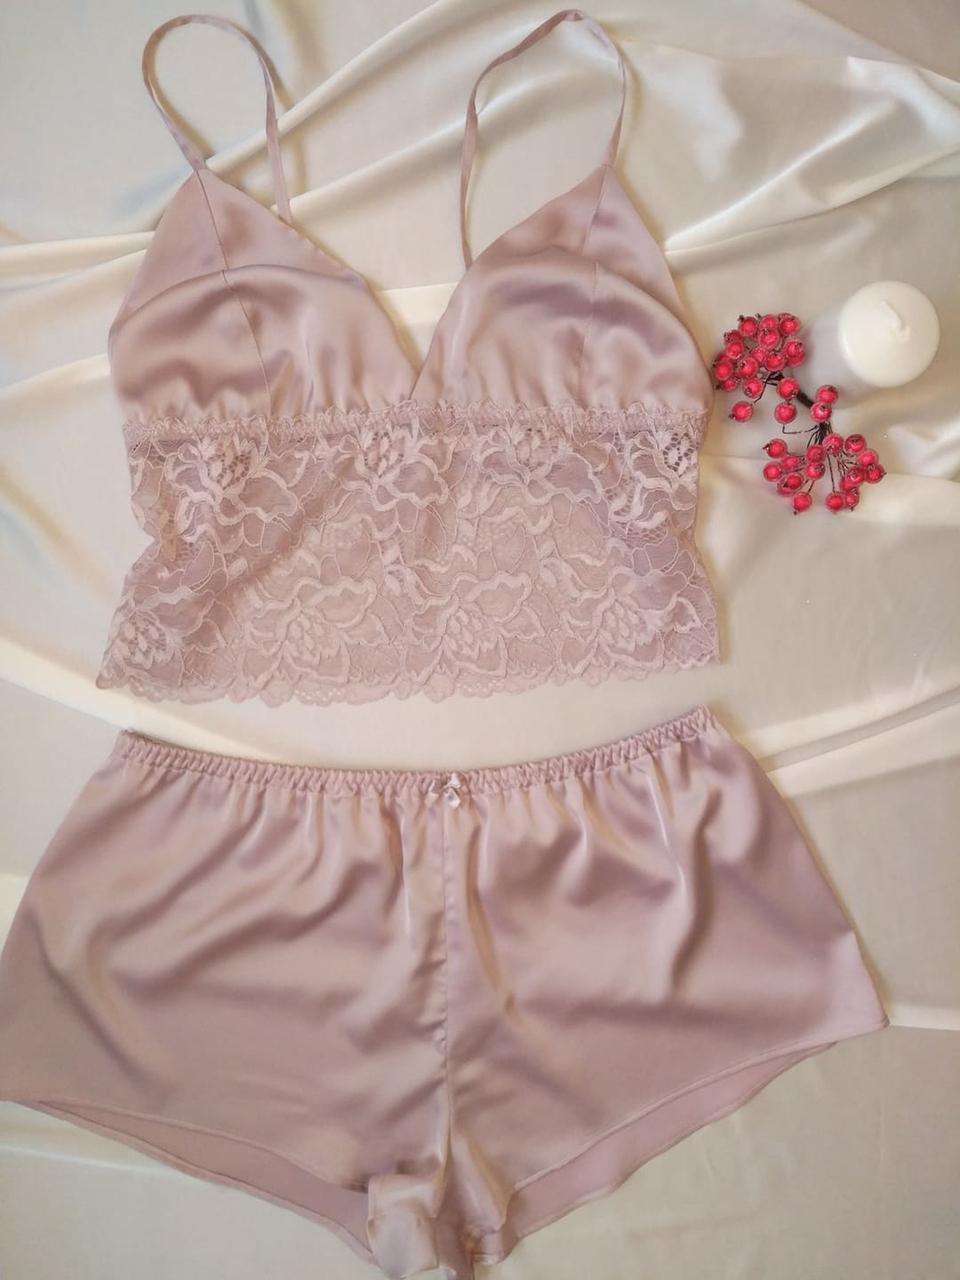 Піжама жіноча шовк мереживо / Пижама женская шелк кружево